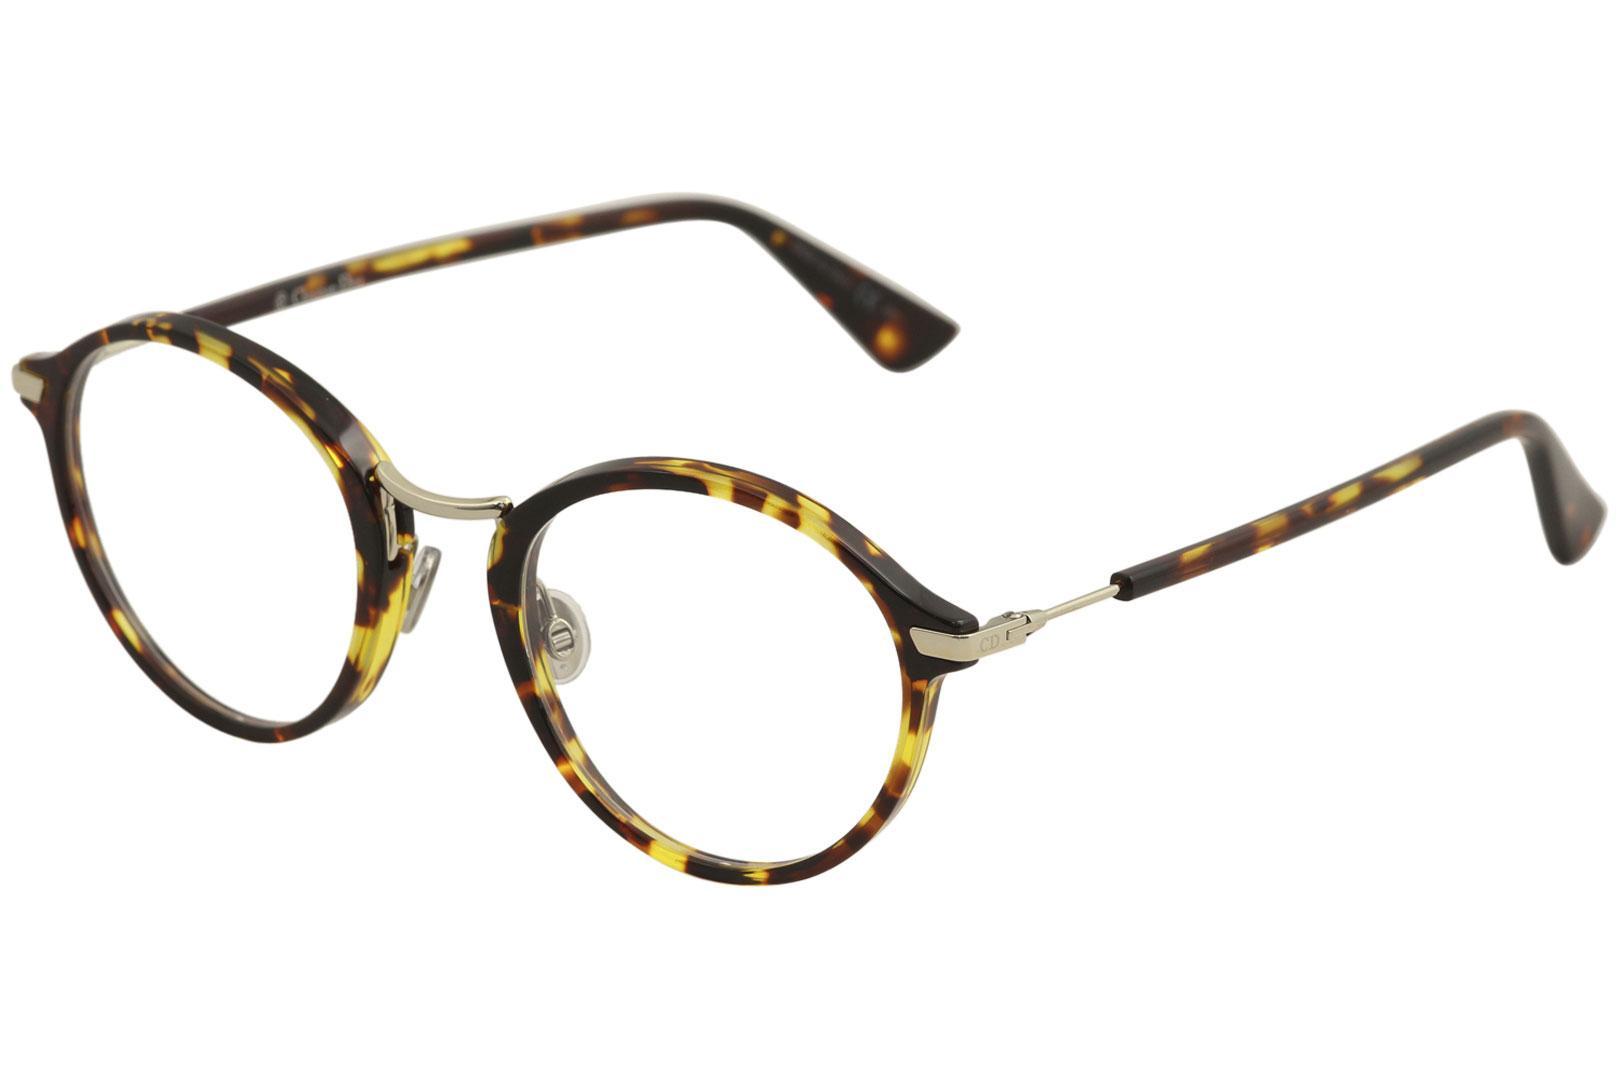 Image of Christian Dior Women's Essence 6 Eyeglasses Full Rim Optical Frame - Brown - Lens 49 Bridge 21 Temple 145mm